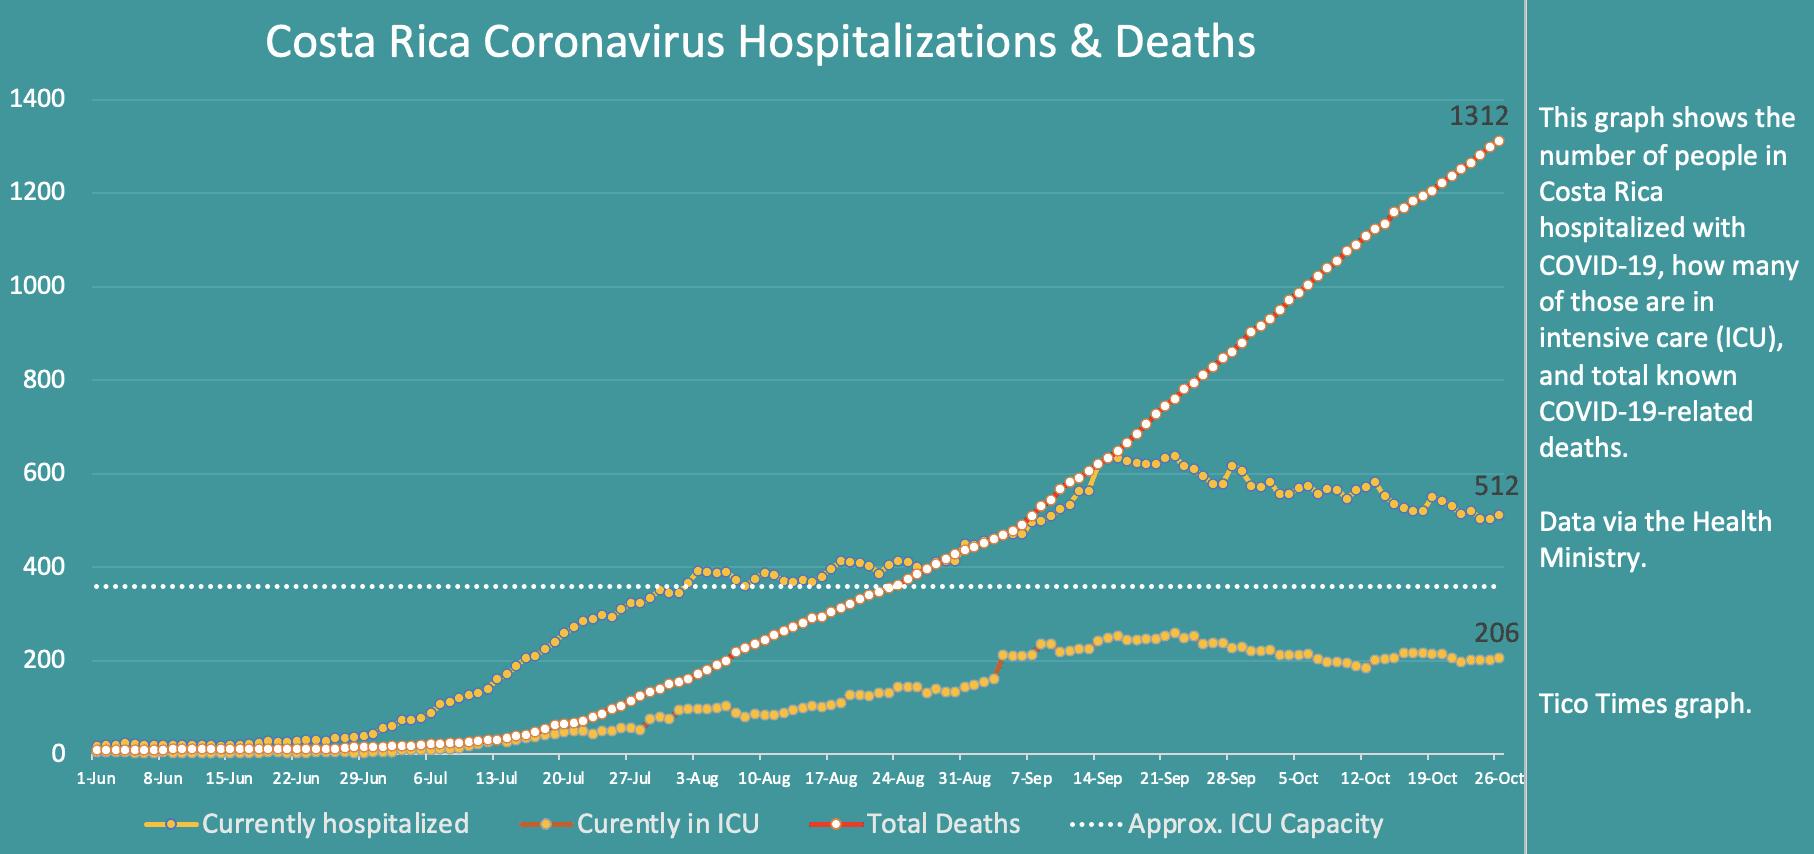 Costa Rica coronavirus hospitalizations and deaths on October 26, 2020